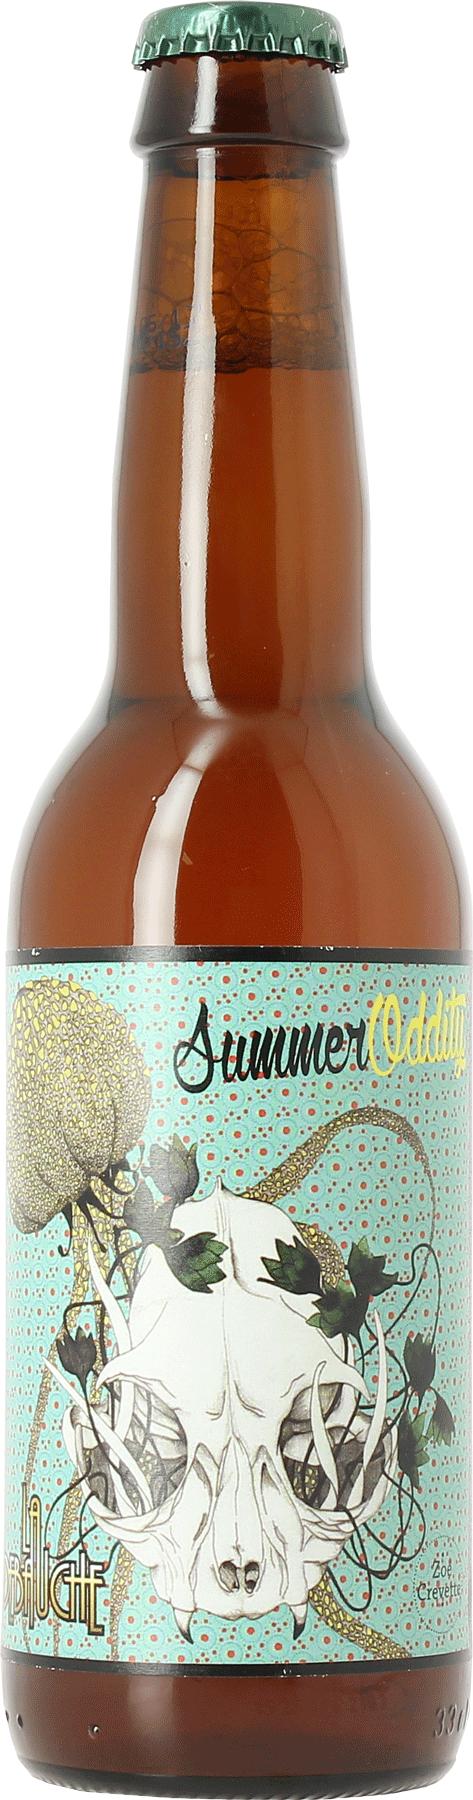 La Débauche Summer Oddity